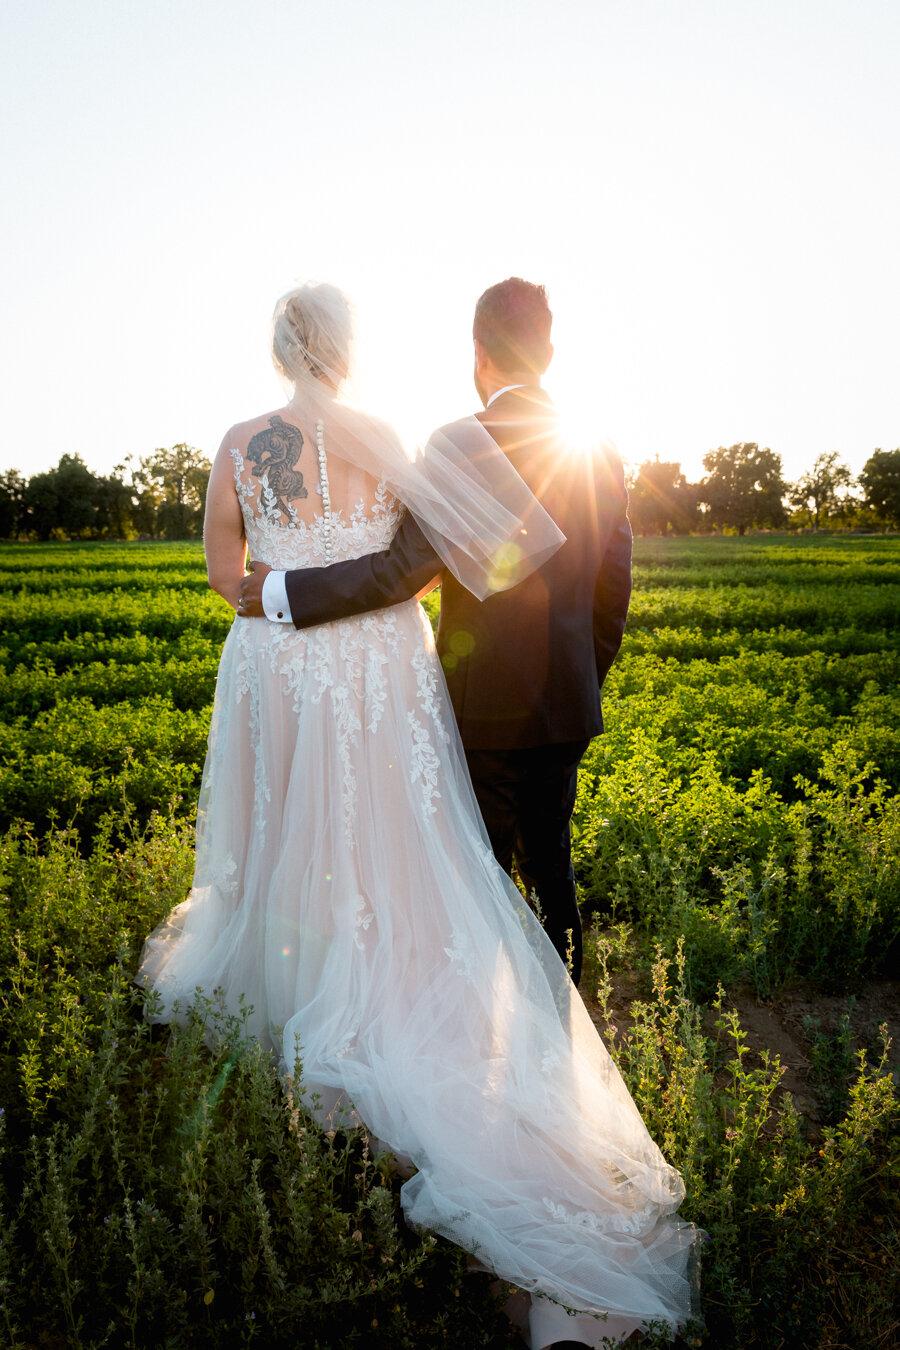 2019.08.24_Emily-Ashir-Wedding-at-the-Maples-6222.jpg